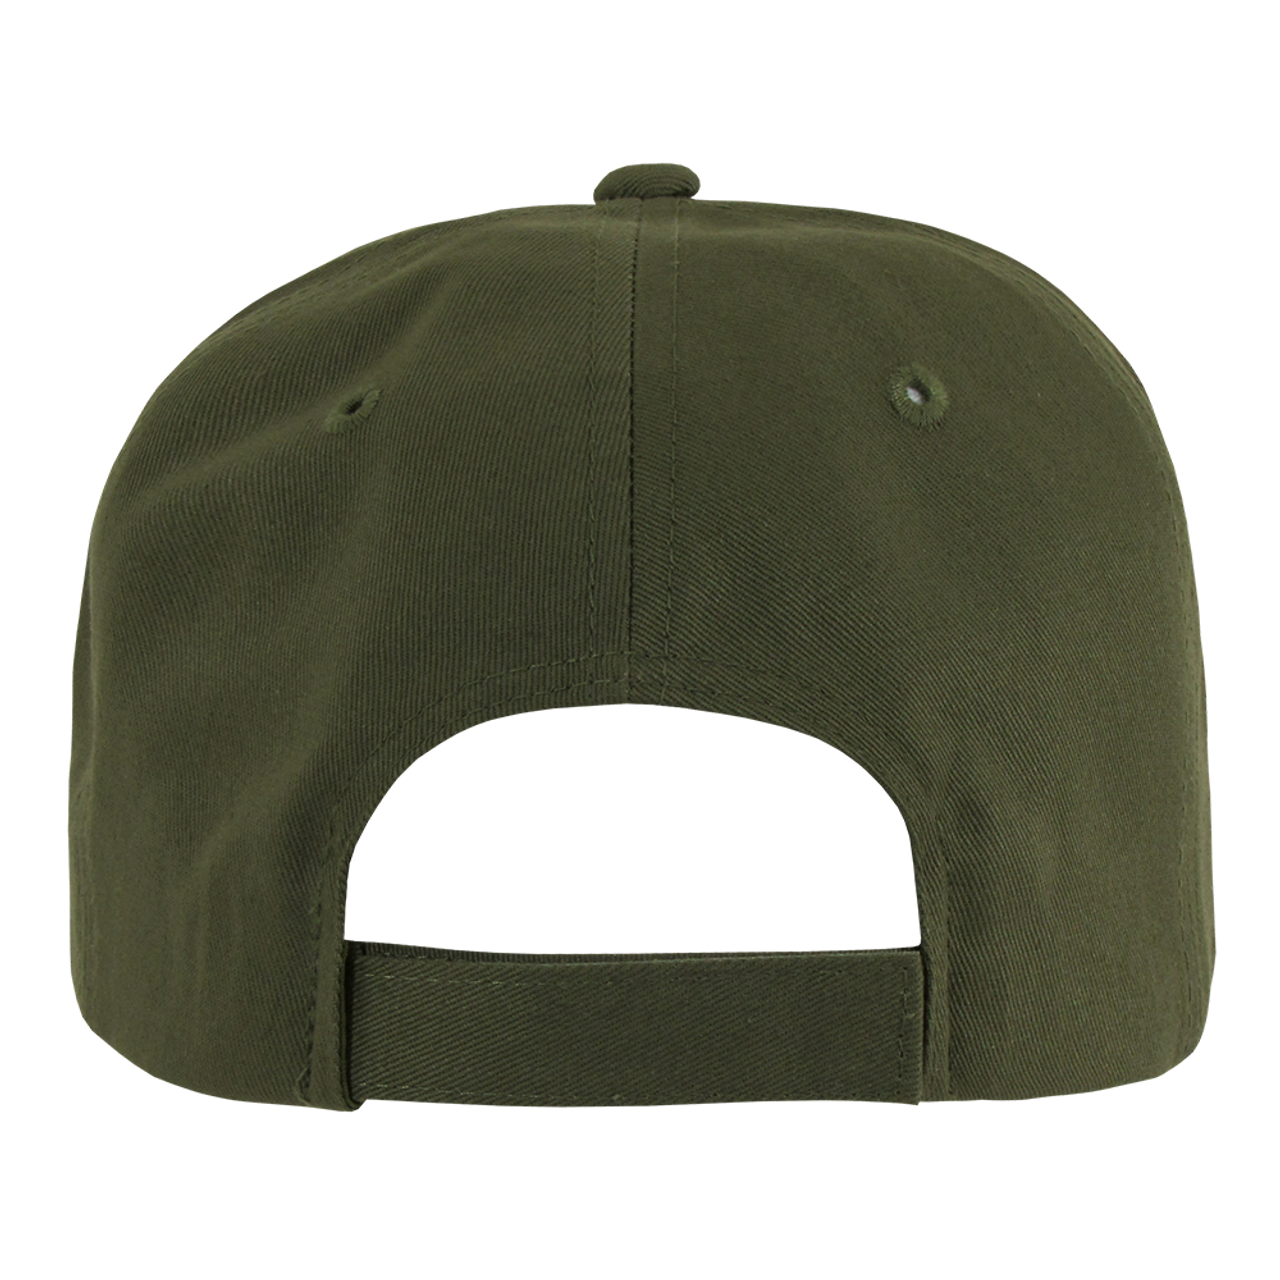 ... T76 - Tactical Operator Cap - American Flag Subdued - Olive Drab ... c854981e736